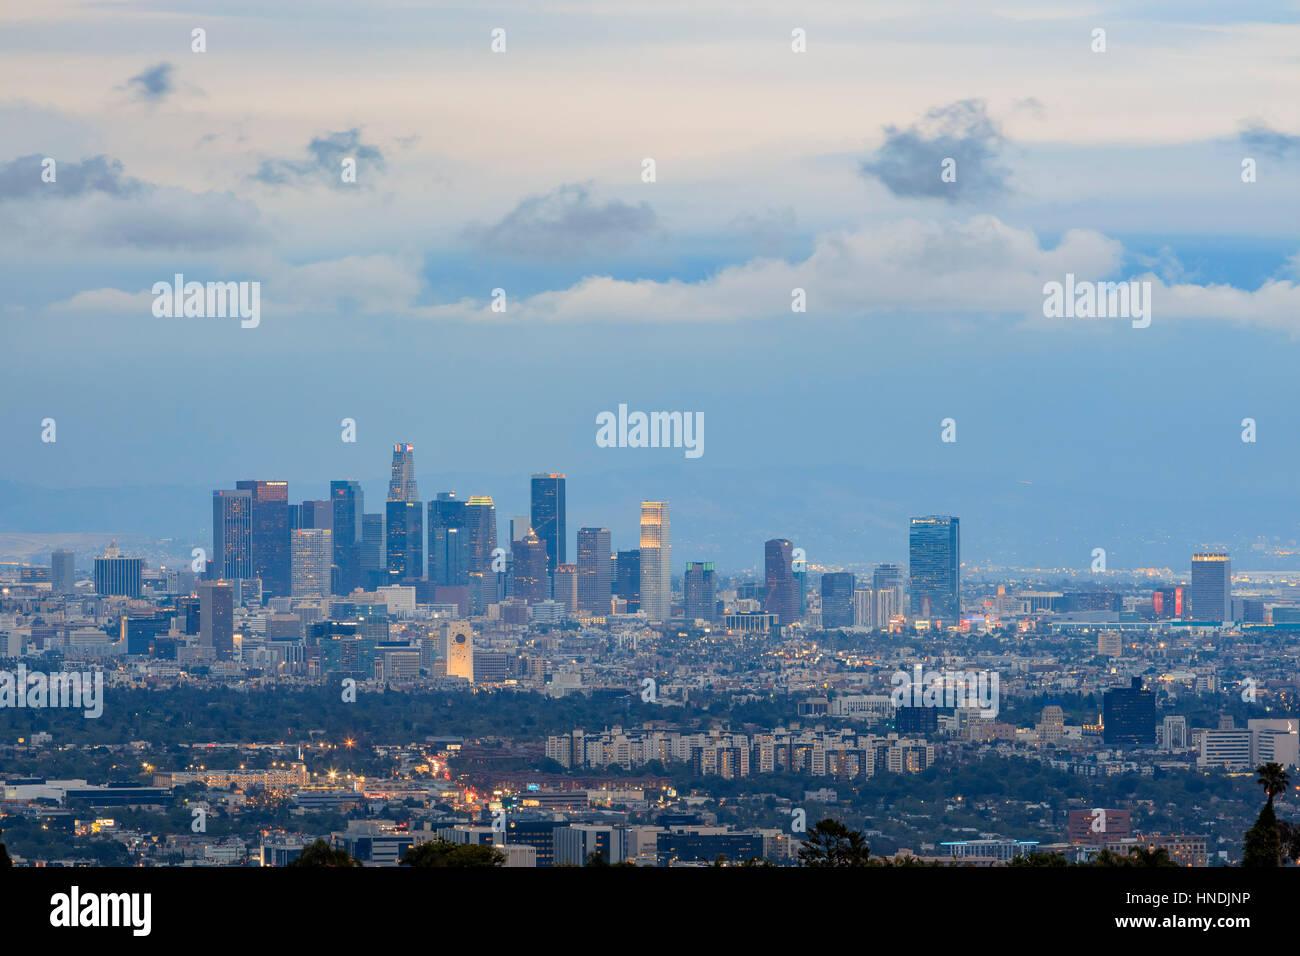 los angeles skyline view - photo #44